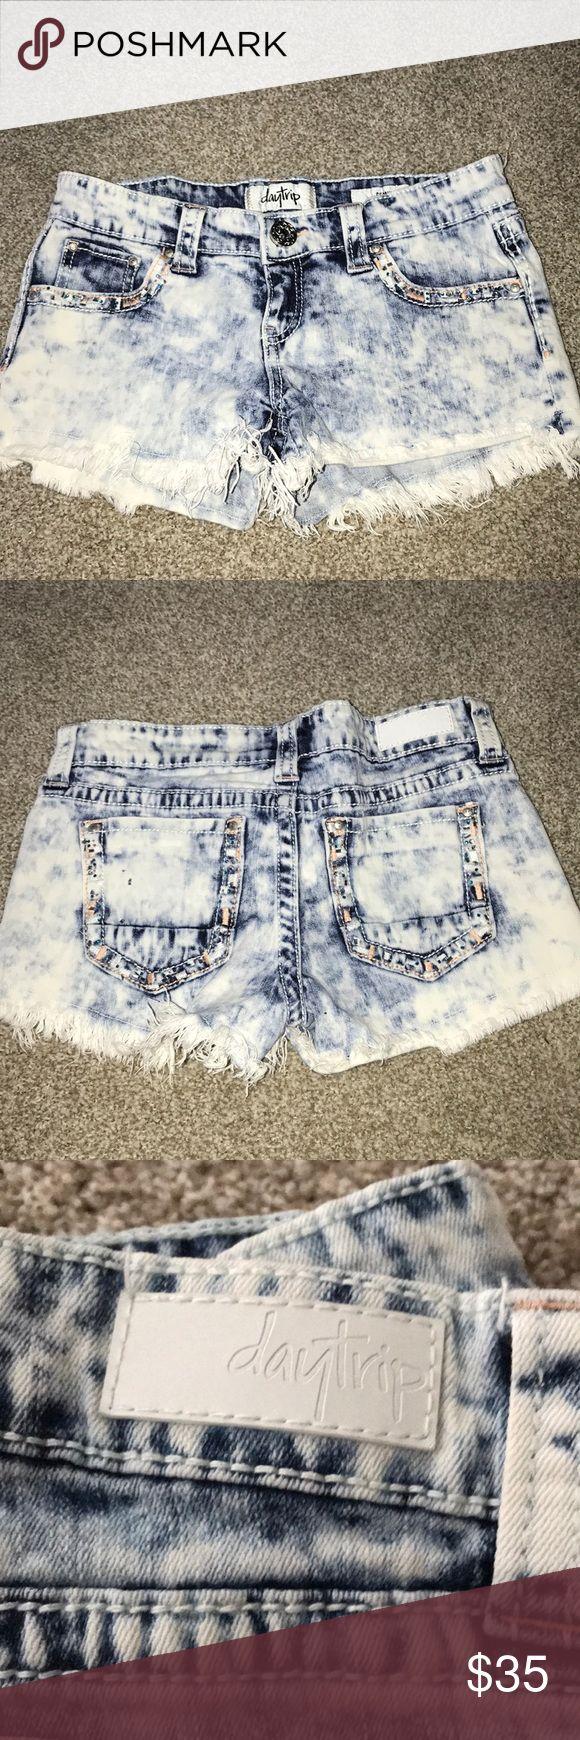 Daytrip shorts Daytrip acid wash shorts with bling detail Daytrip Shorts Jean Shorts